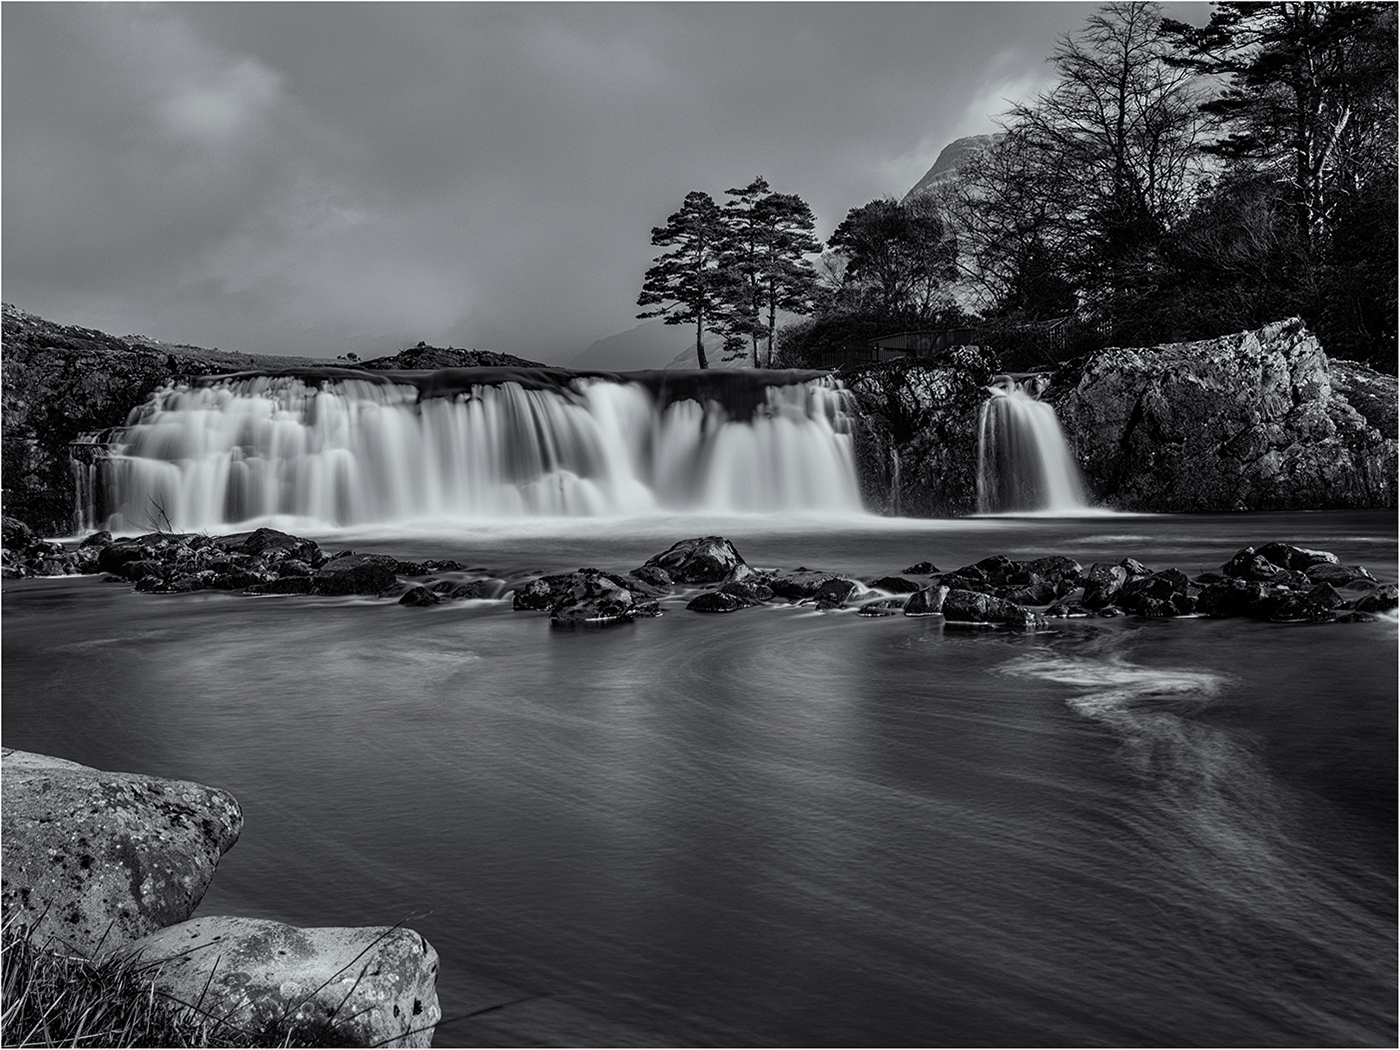 BPICPOTYR2_Waterfall_Michael_Byrne_Advanced.jpg